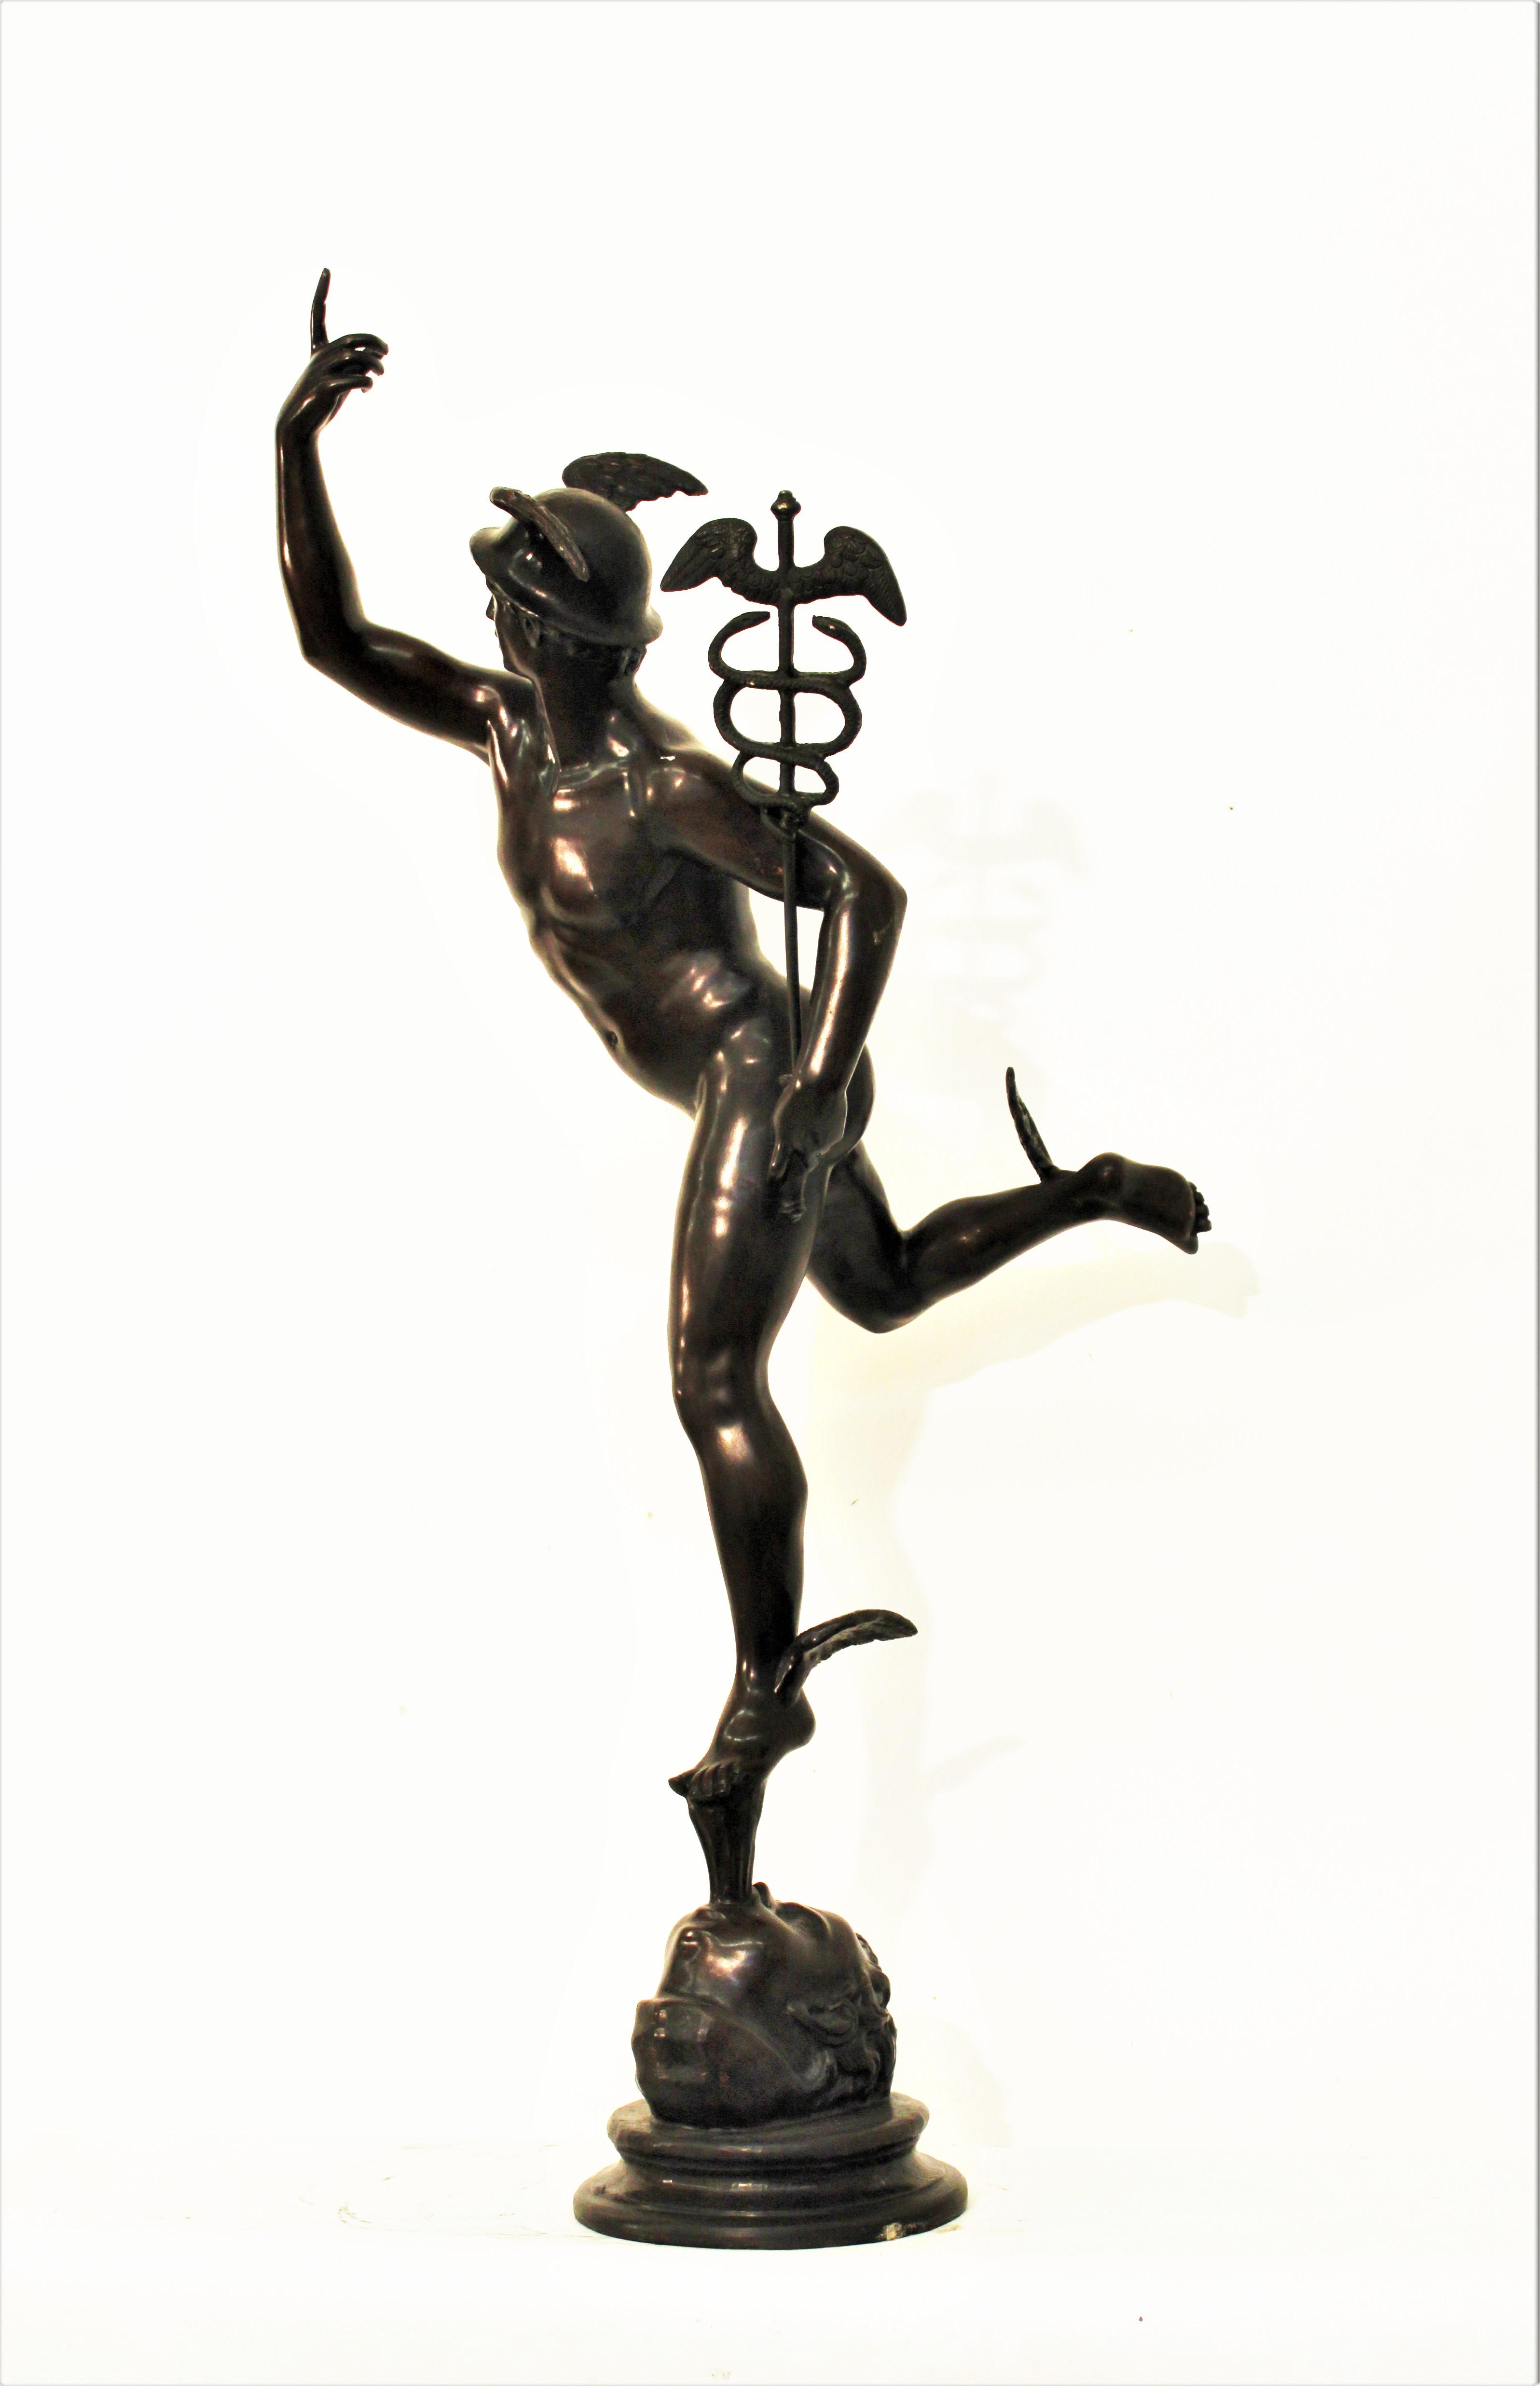 Lot. 59 grande mercurio in bronzo